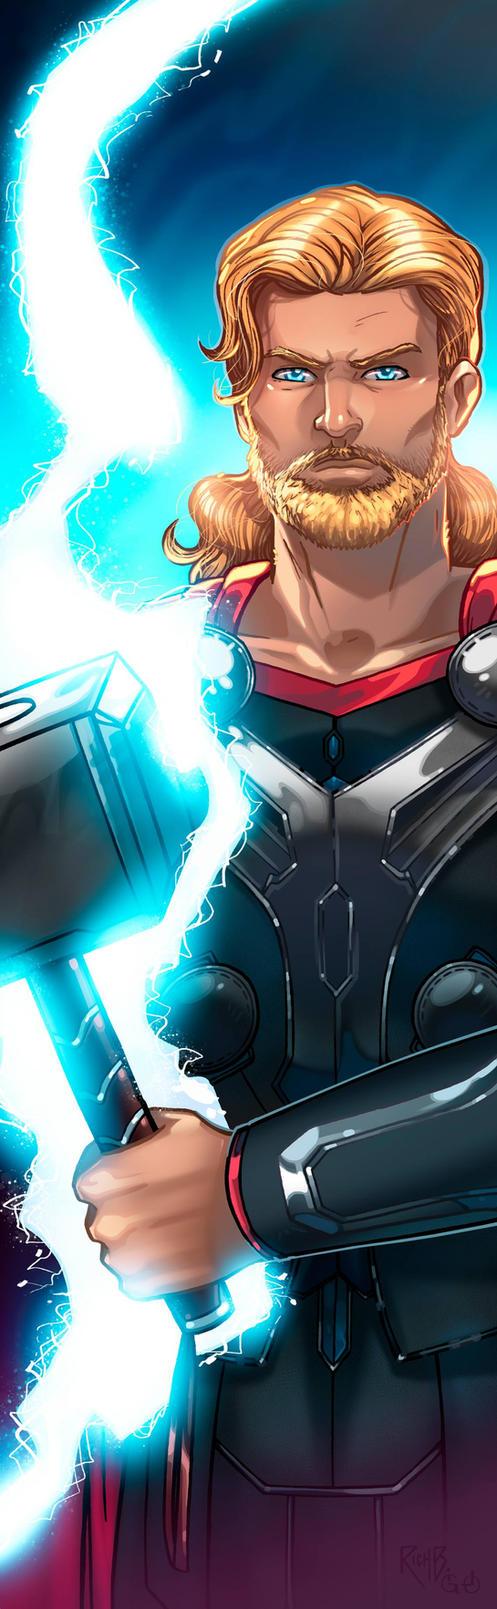 Thor Panel Art 2 by RichBernatovech